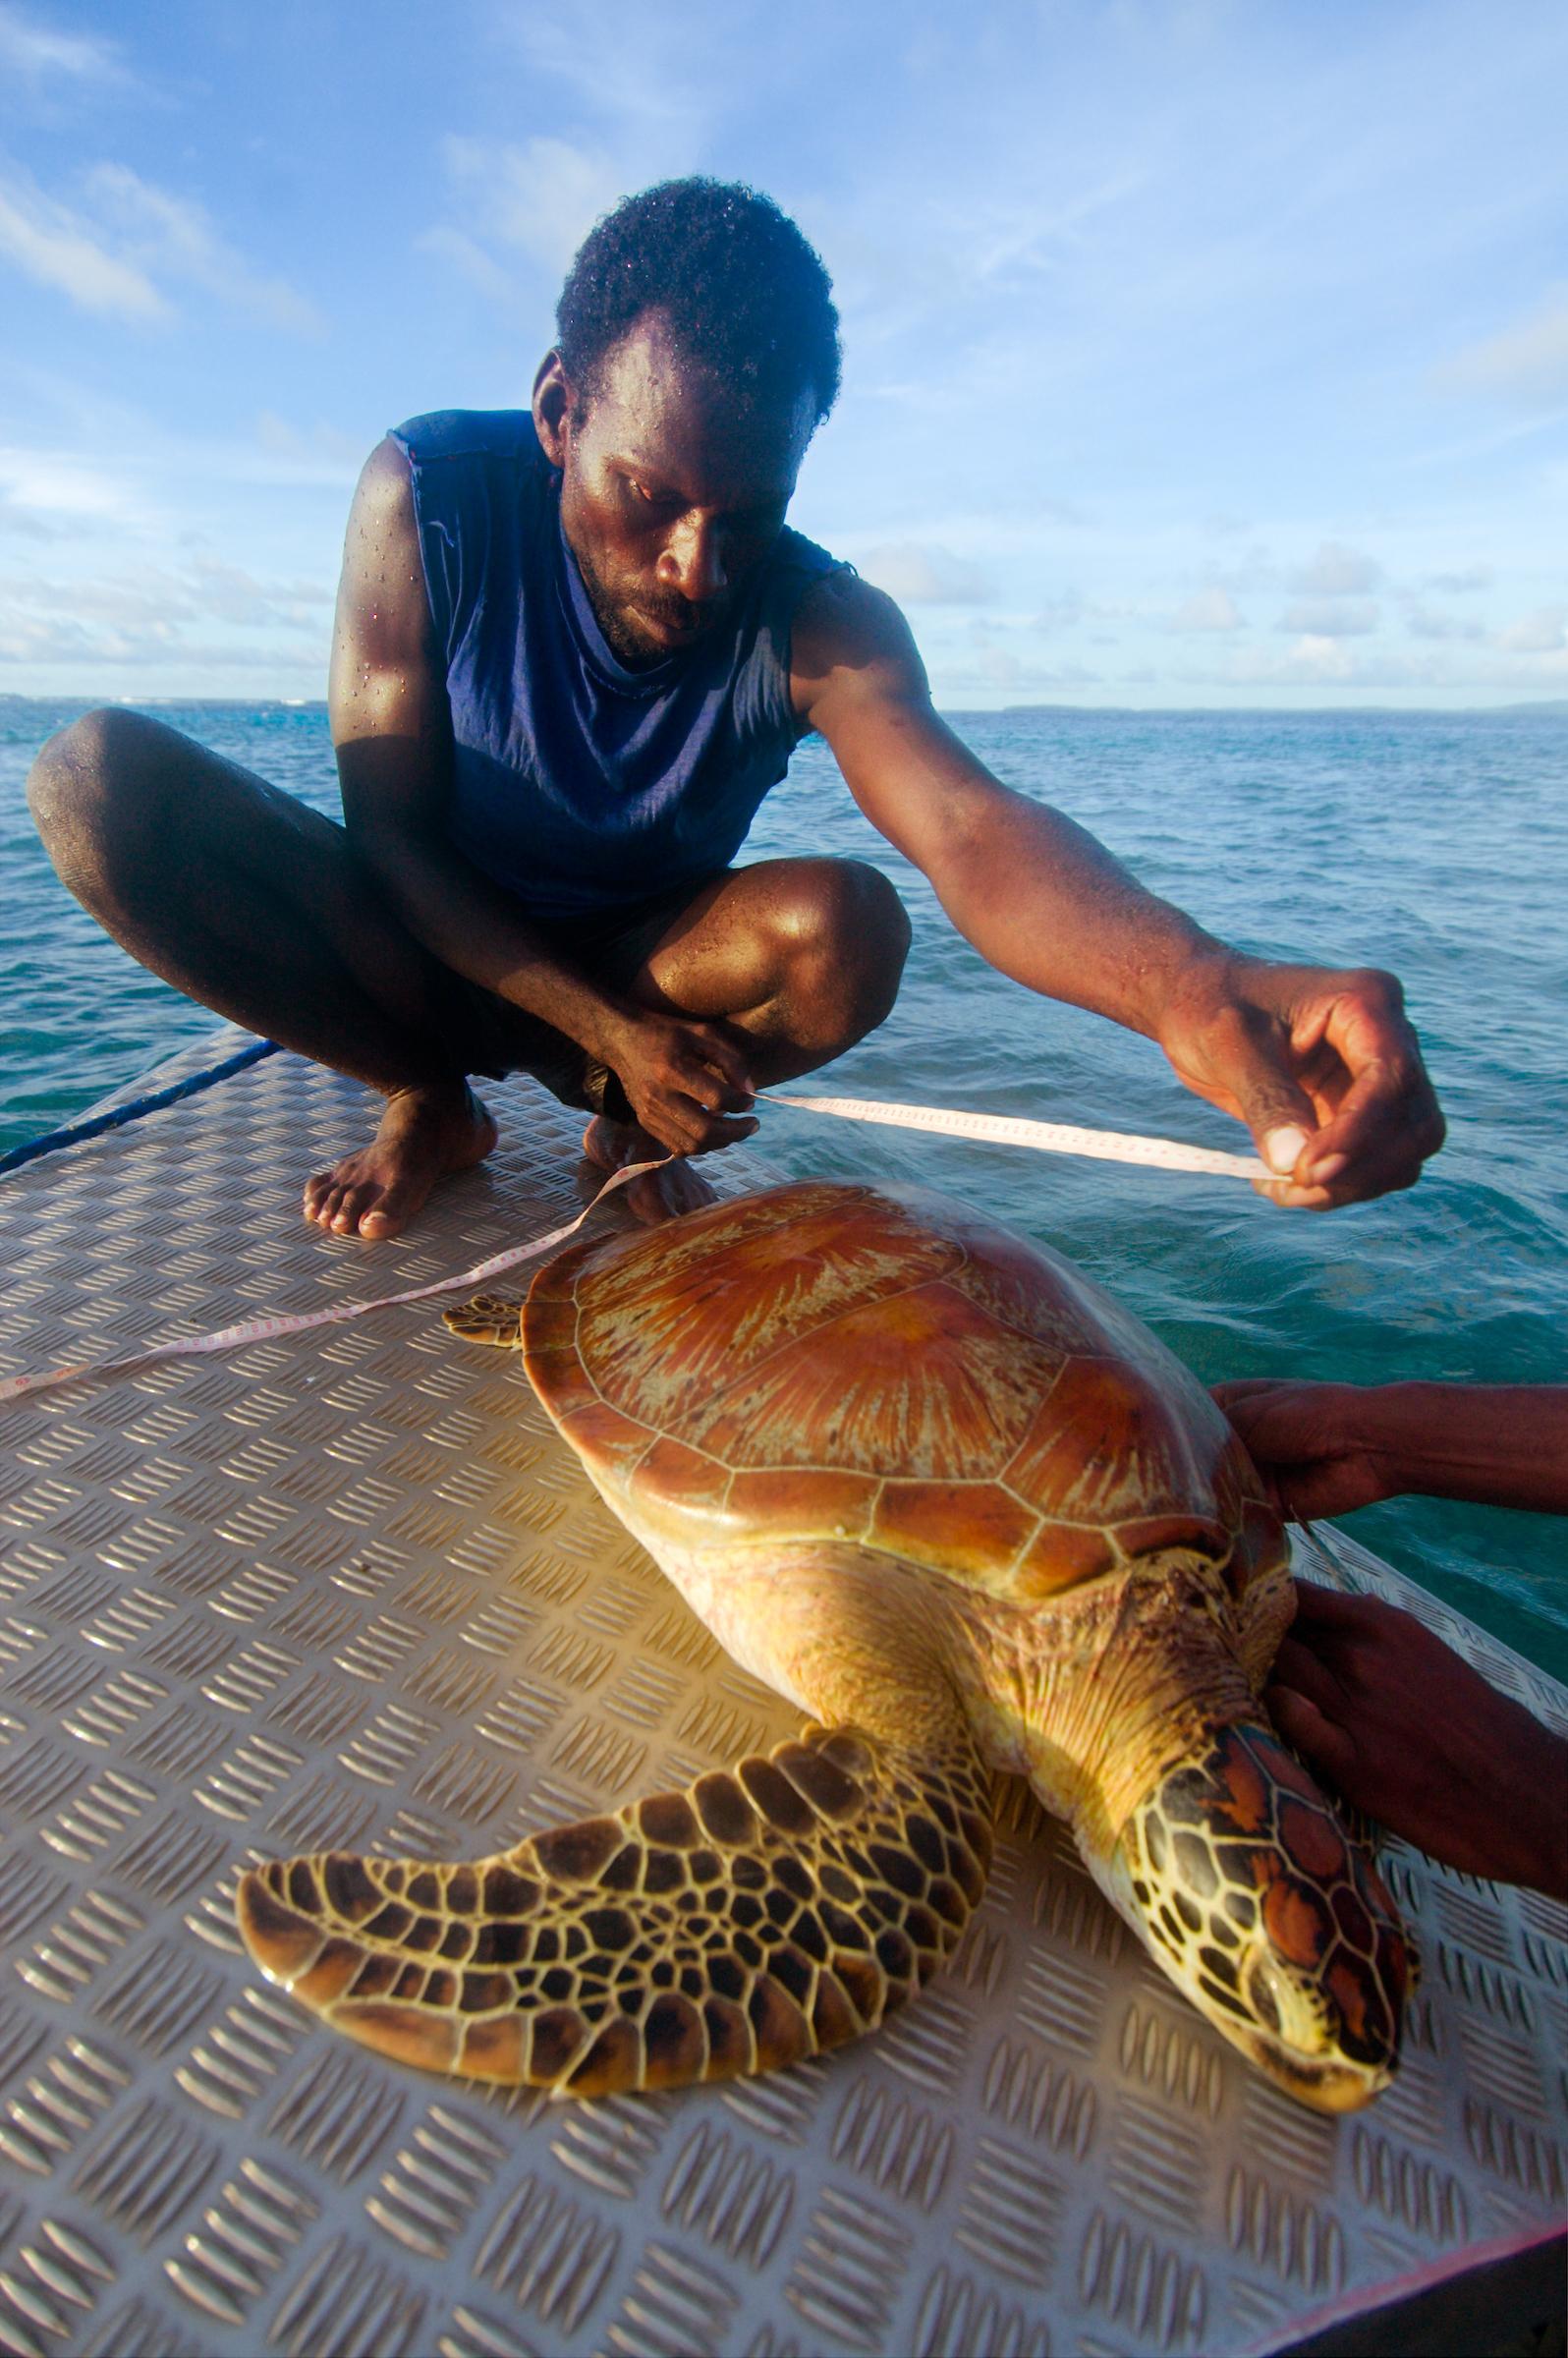 Arnavon_Islands_Solomons_055.jpg